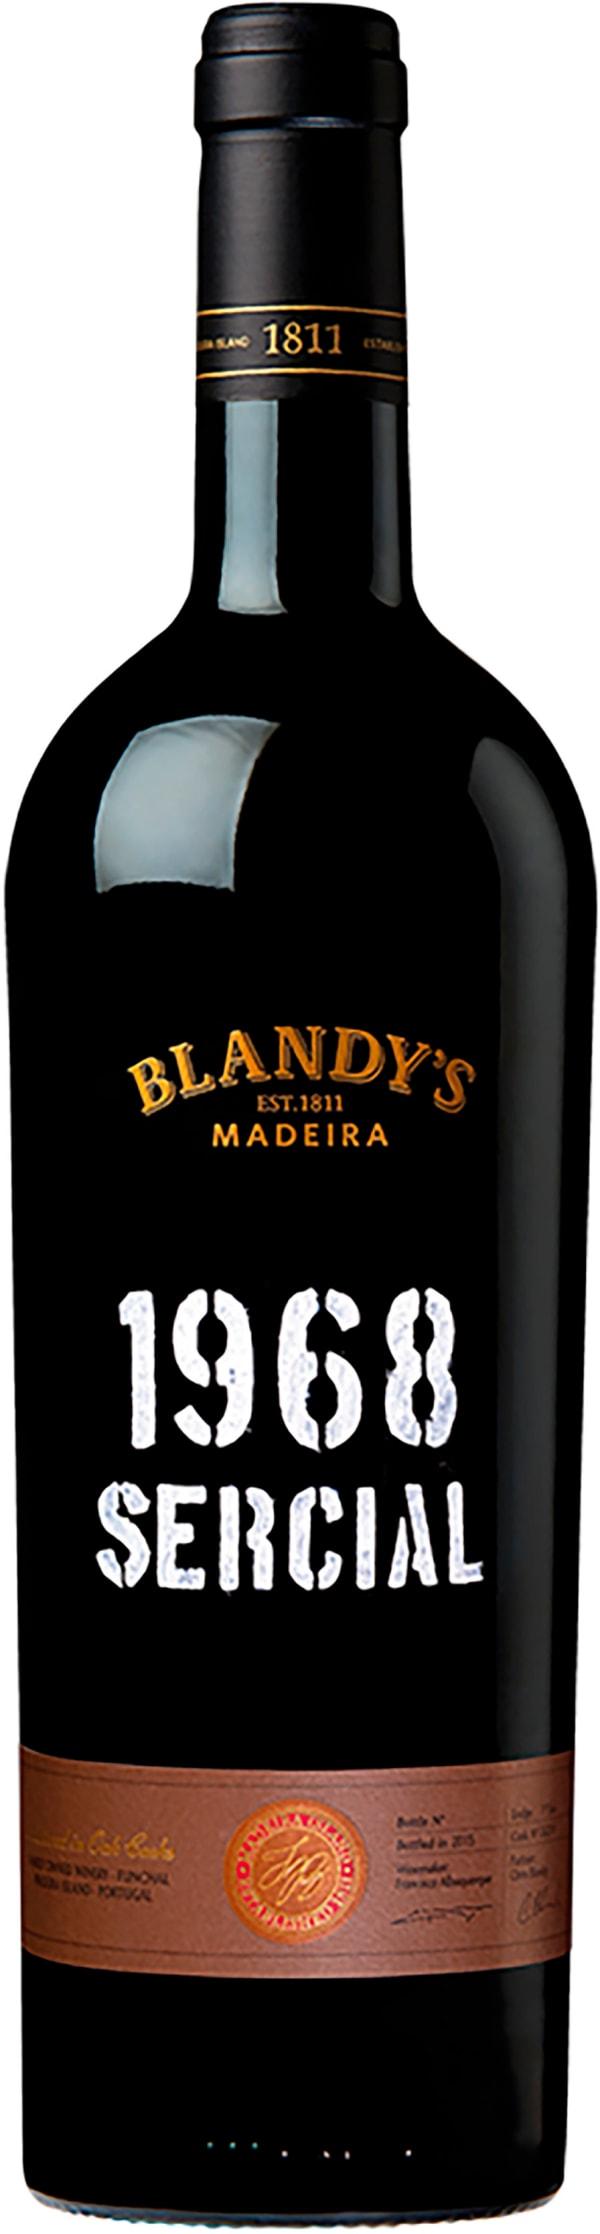 Blandy's Sercial 1968 Vintage Madeira 1968